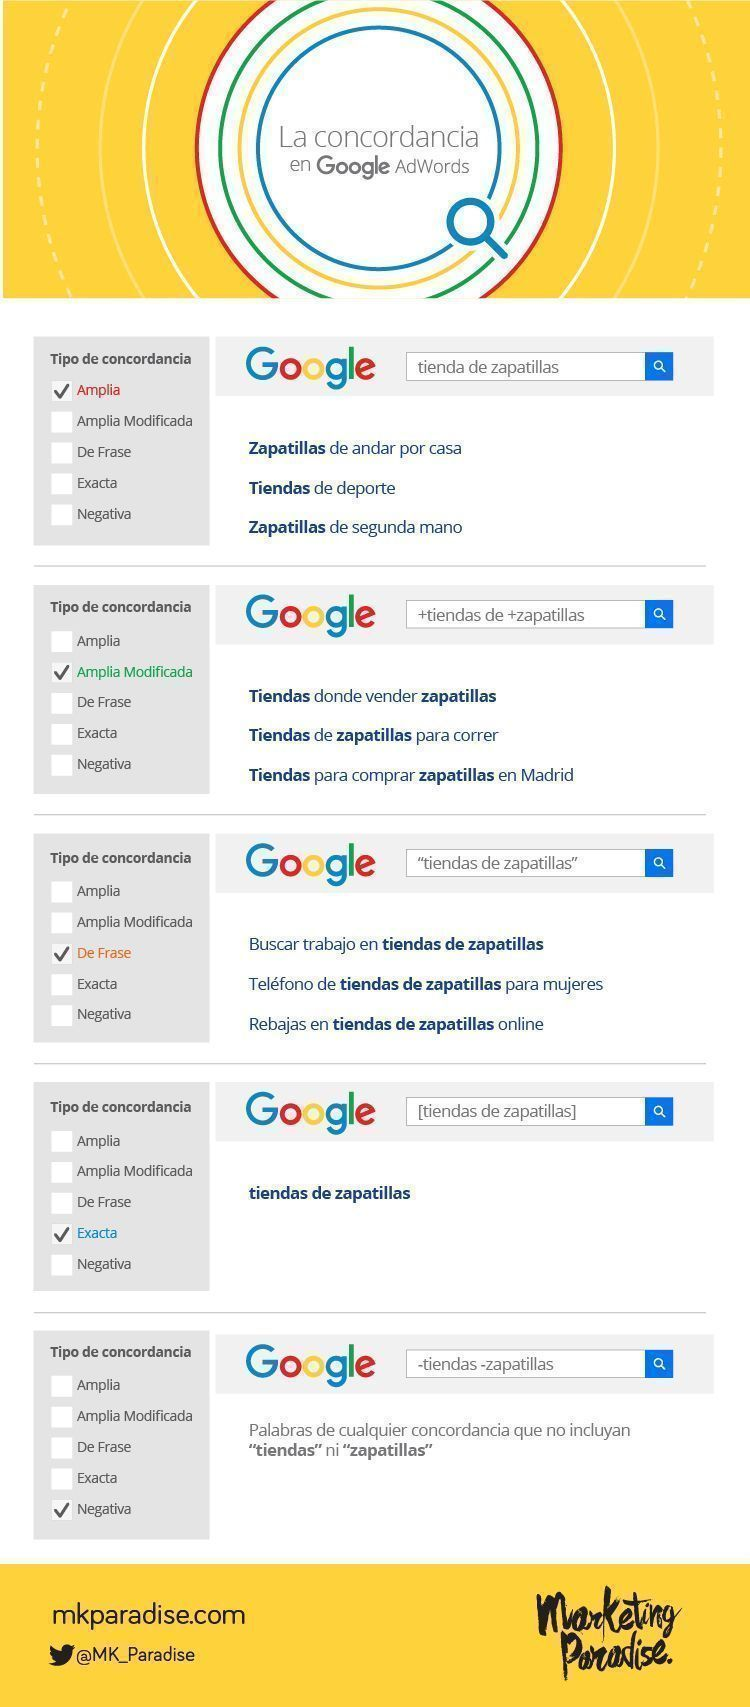 infografia-concordancia-adwords